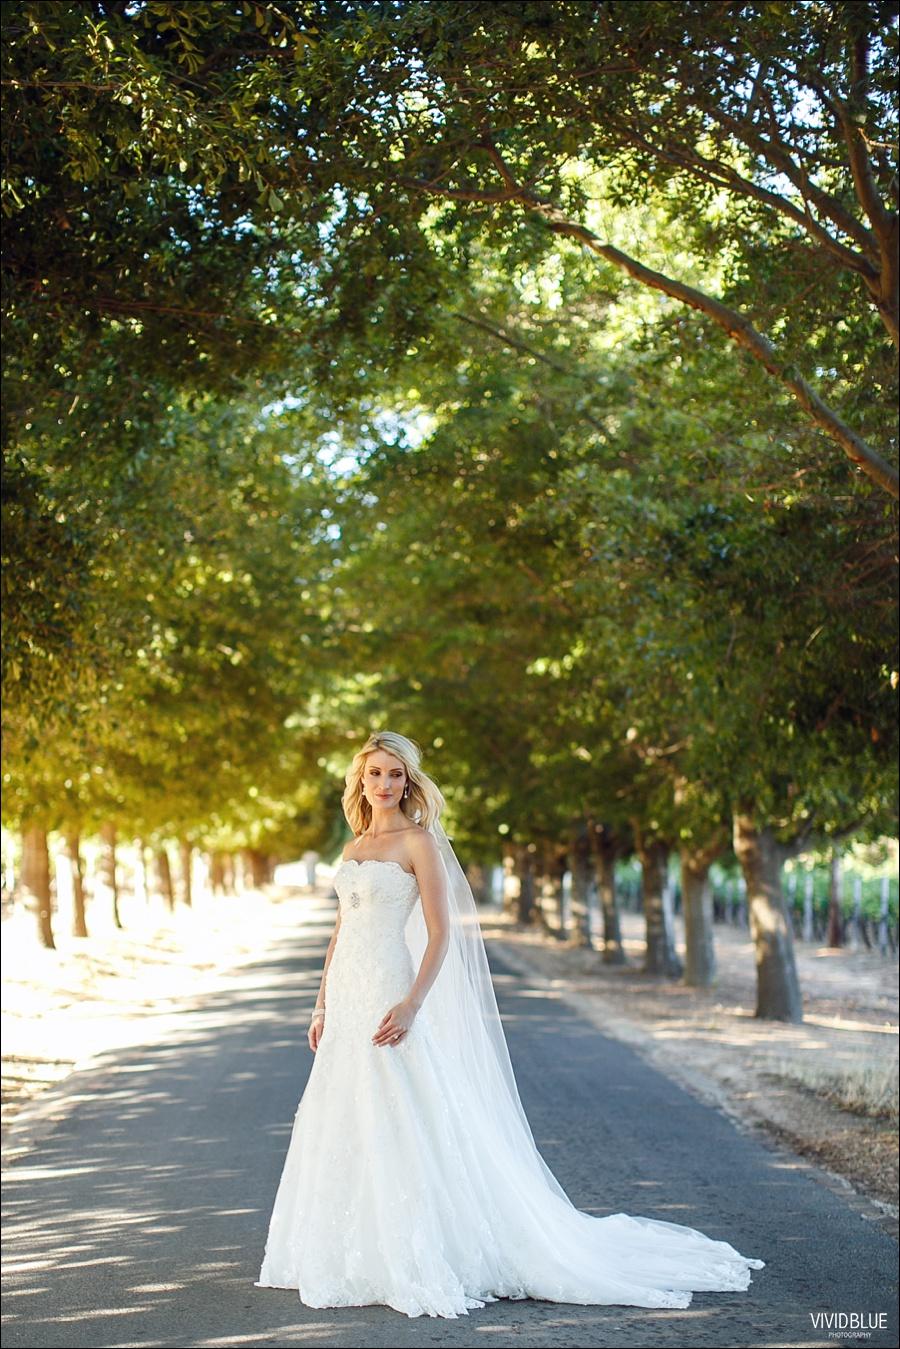 VividBlue-phil-erin-wedding-backberg-south-africa044